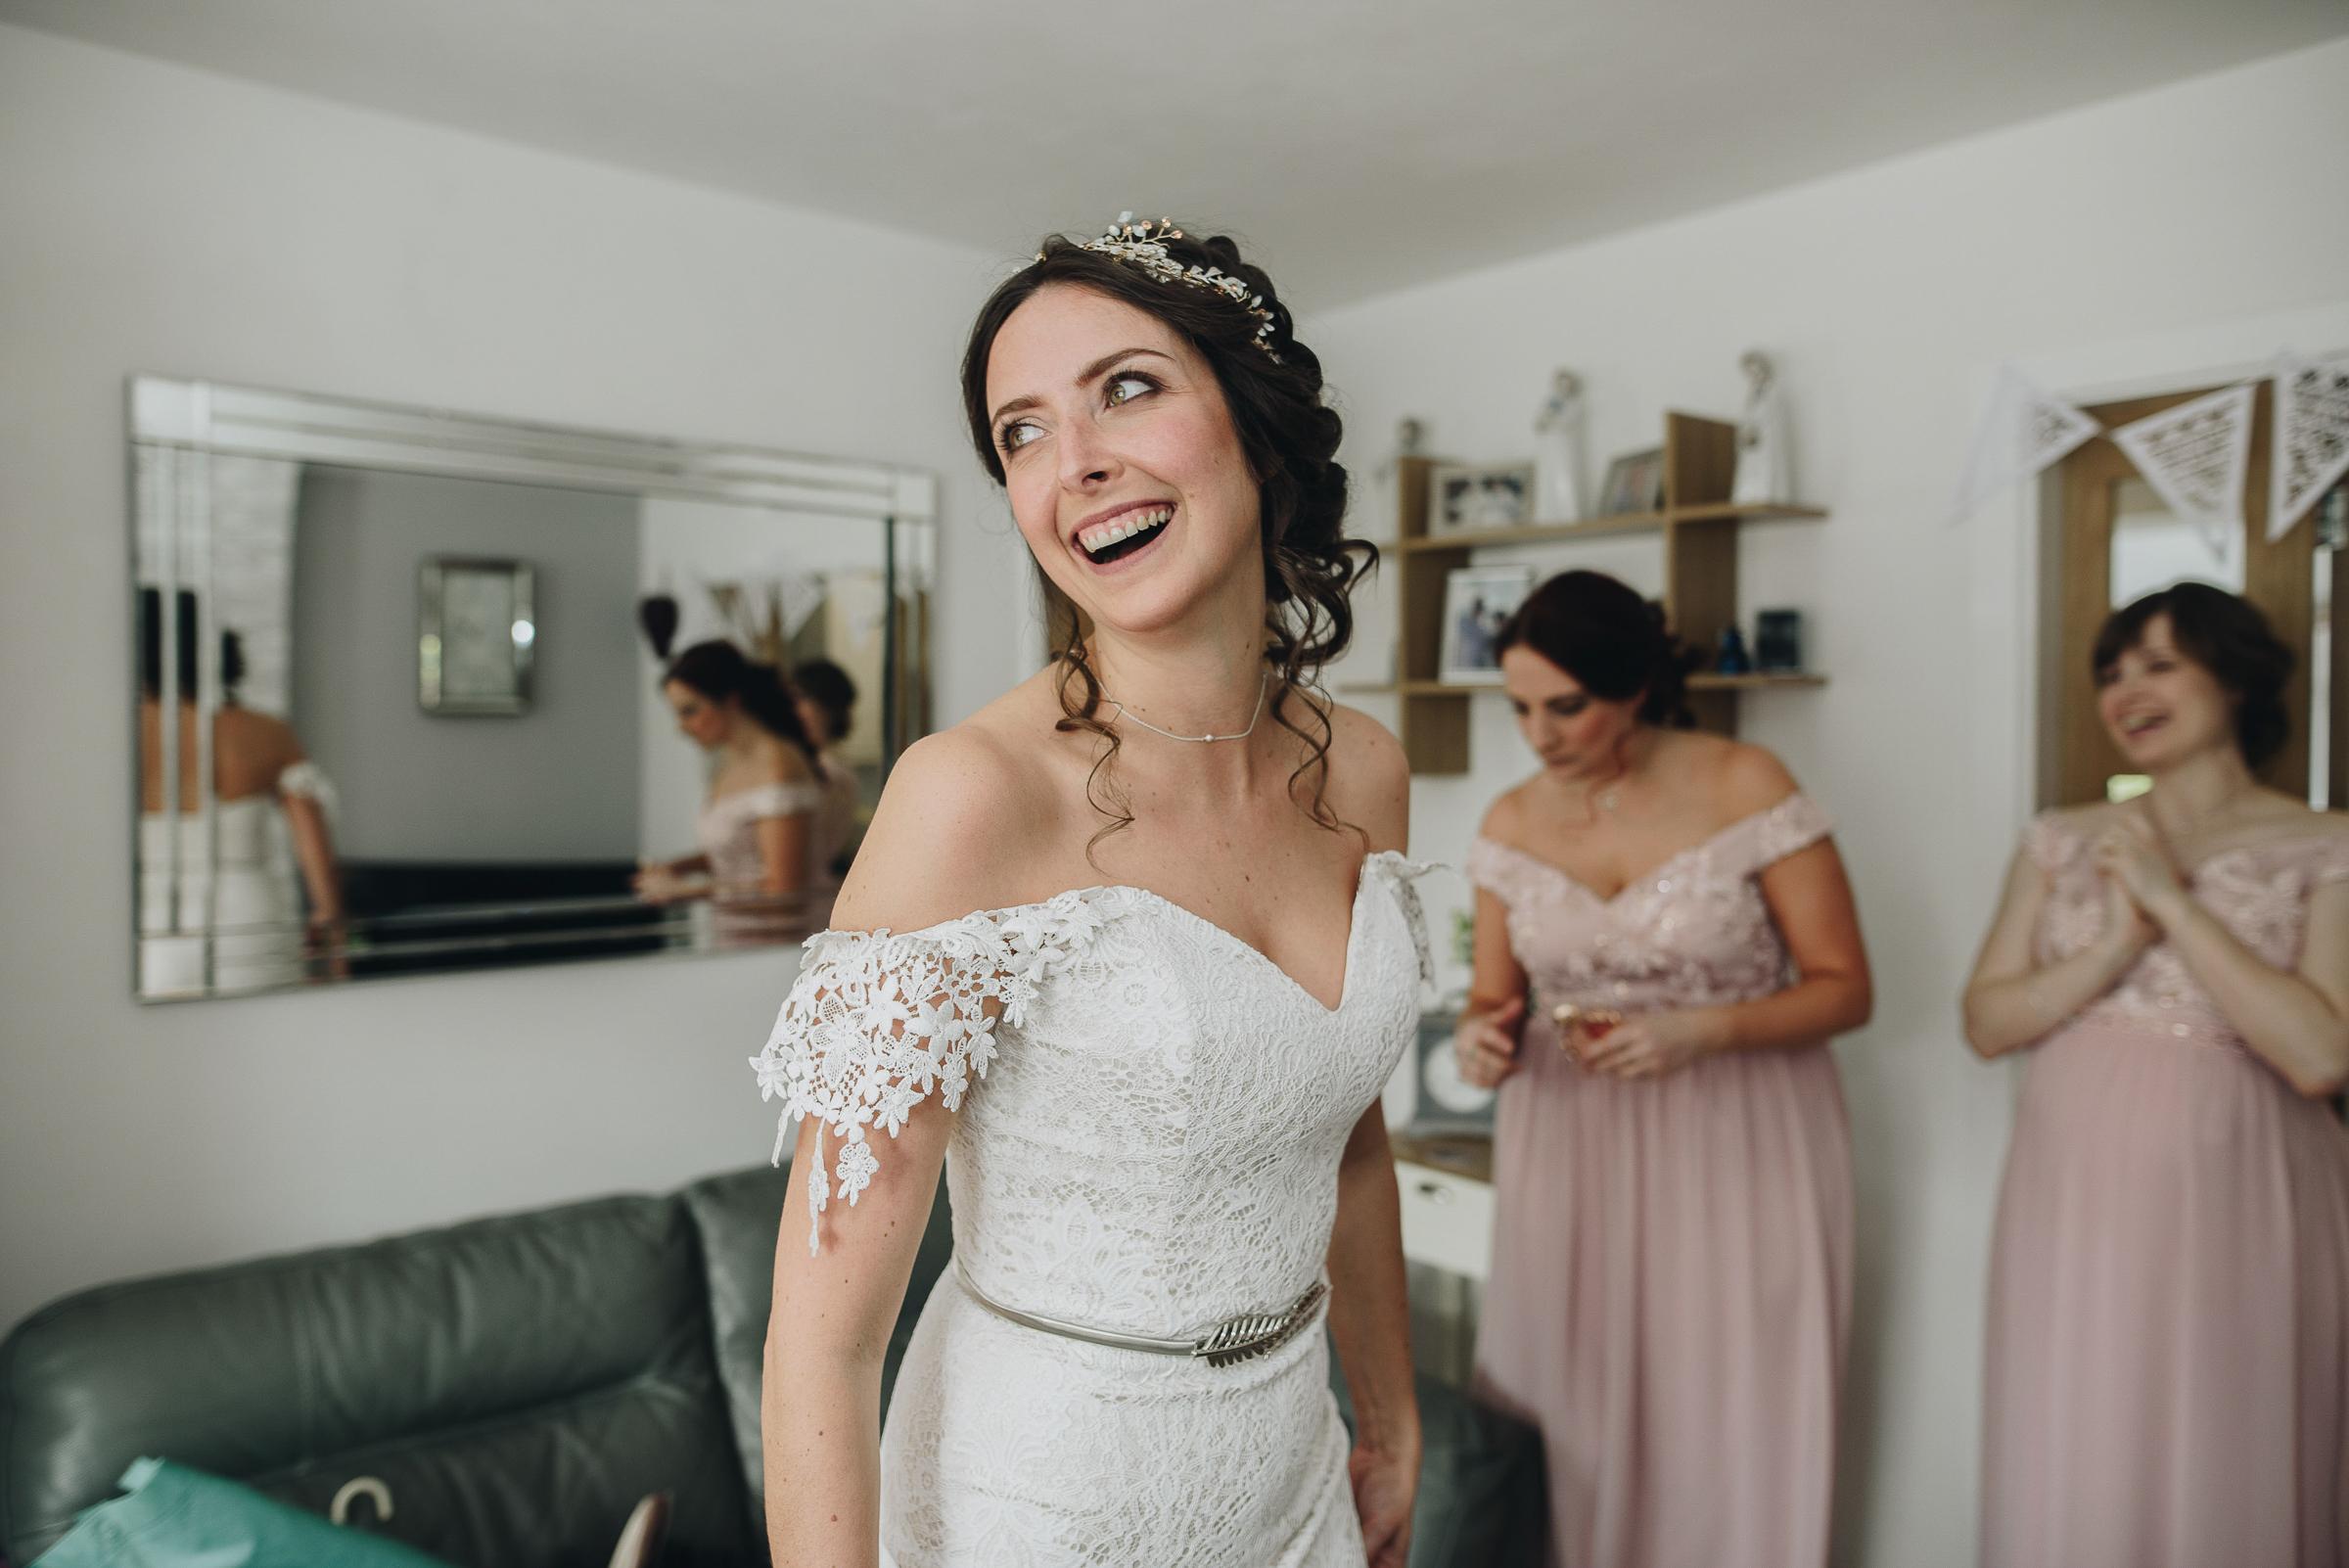 Rochdale-town-hall-vegan-harry-potter-wedding-photography-9.jpg